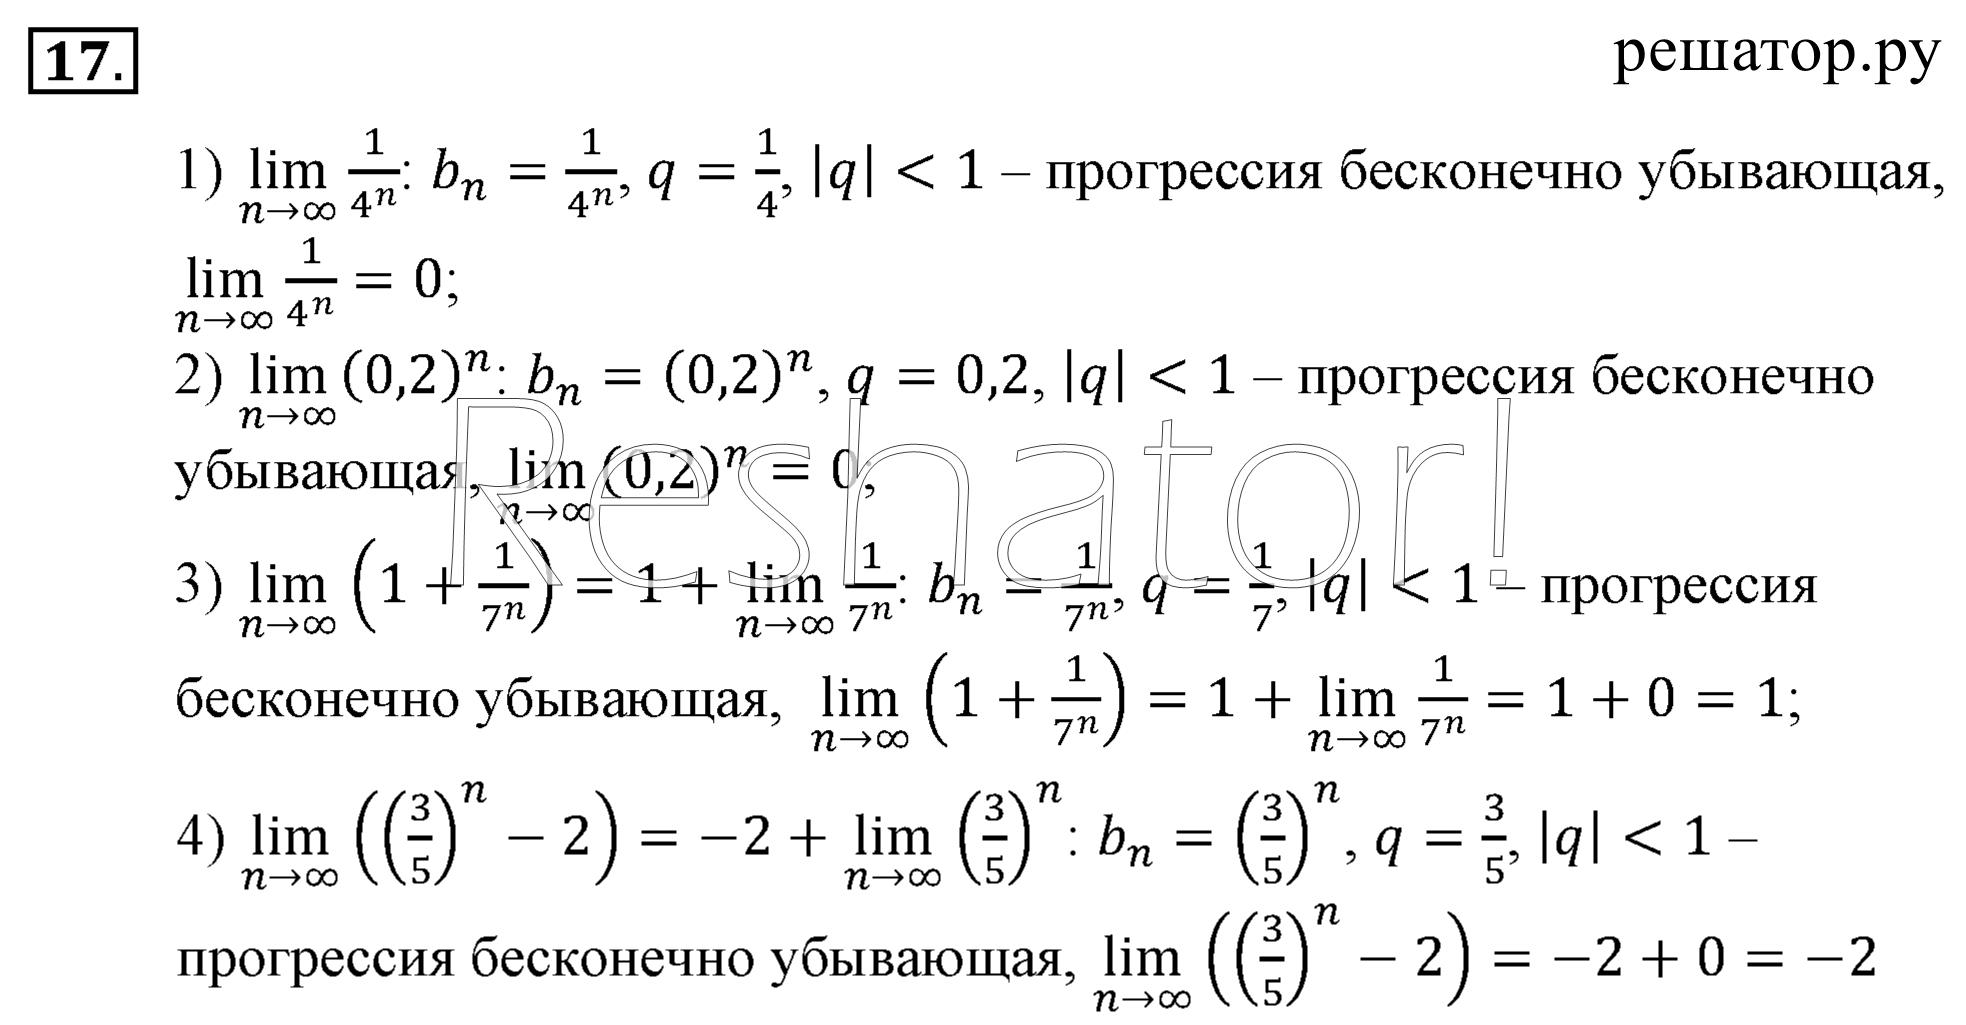 Алгебре алимов по решак гдз